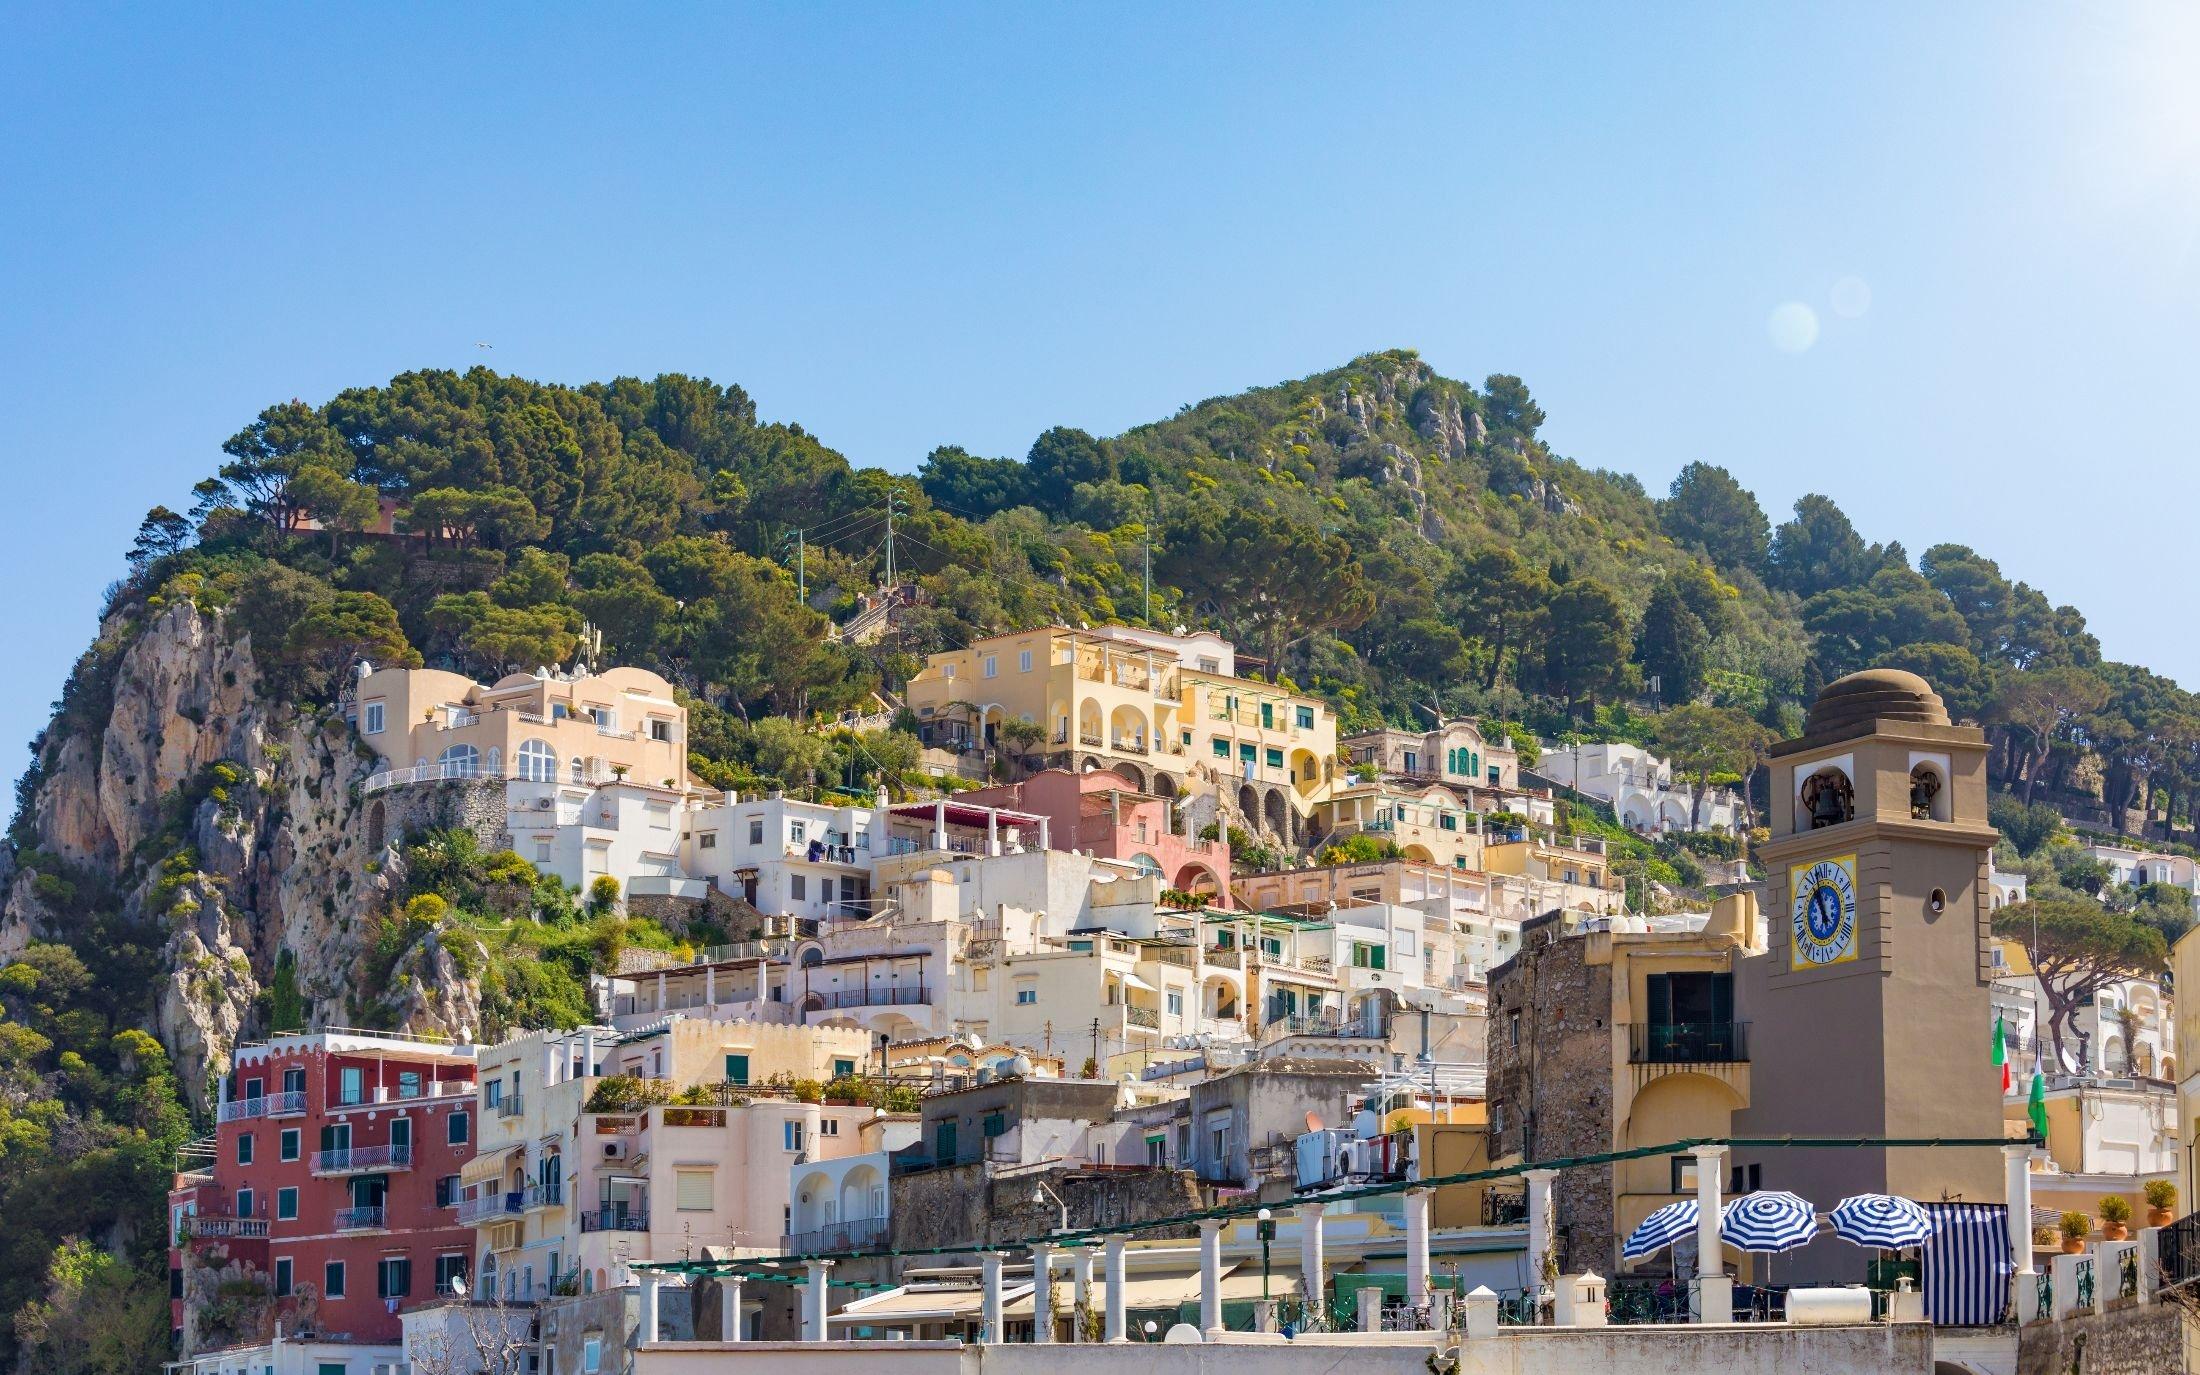 The city landscape of the island of Capri, Italy. (Shutterstock Photo)